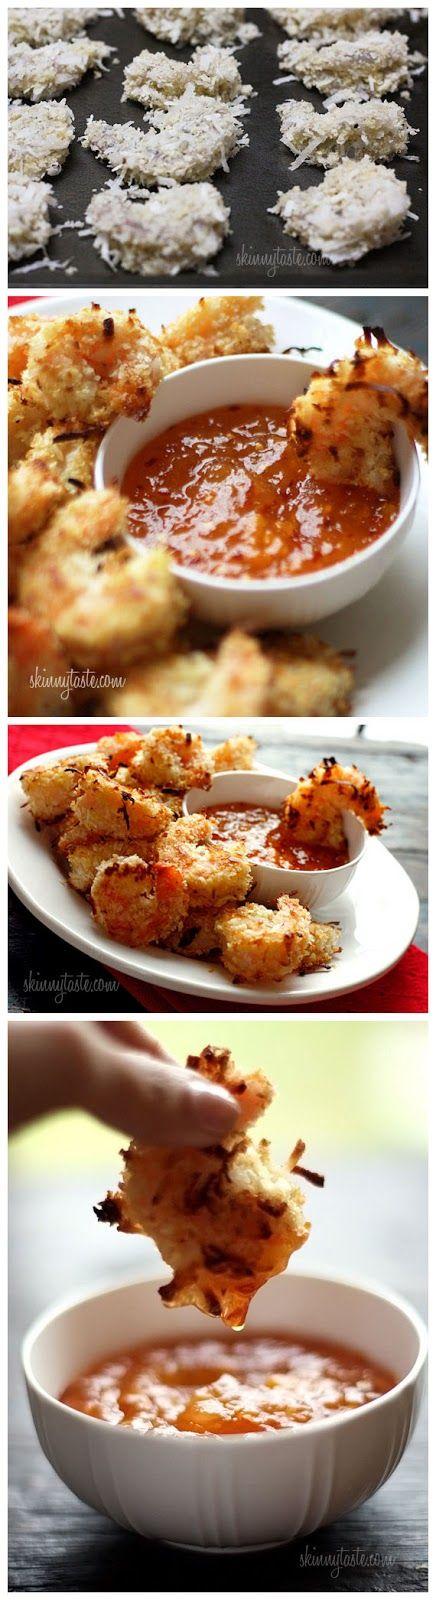 joysama images: Skinny Coconut Shrimp | food | Pinterest